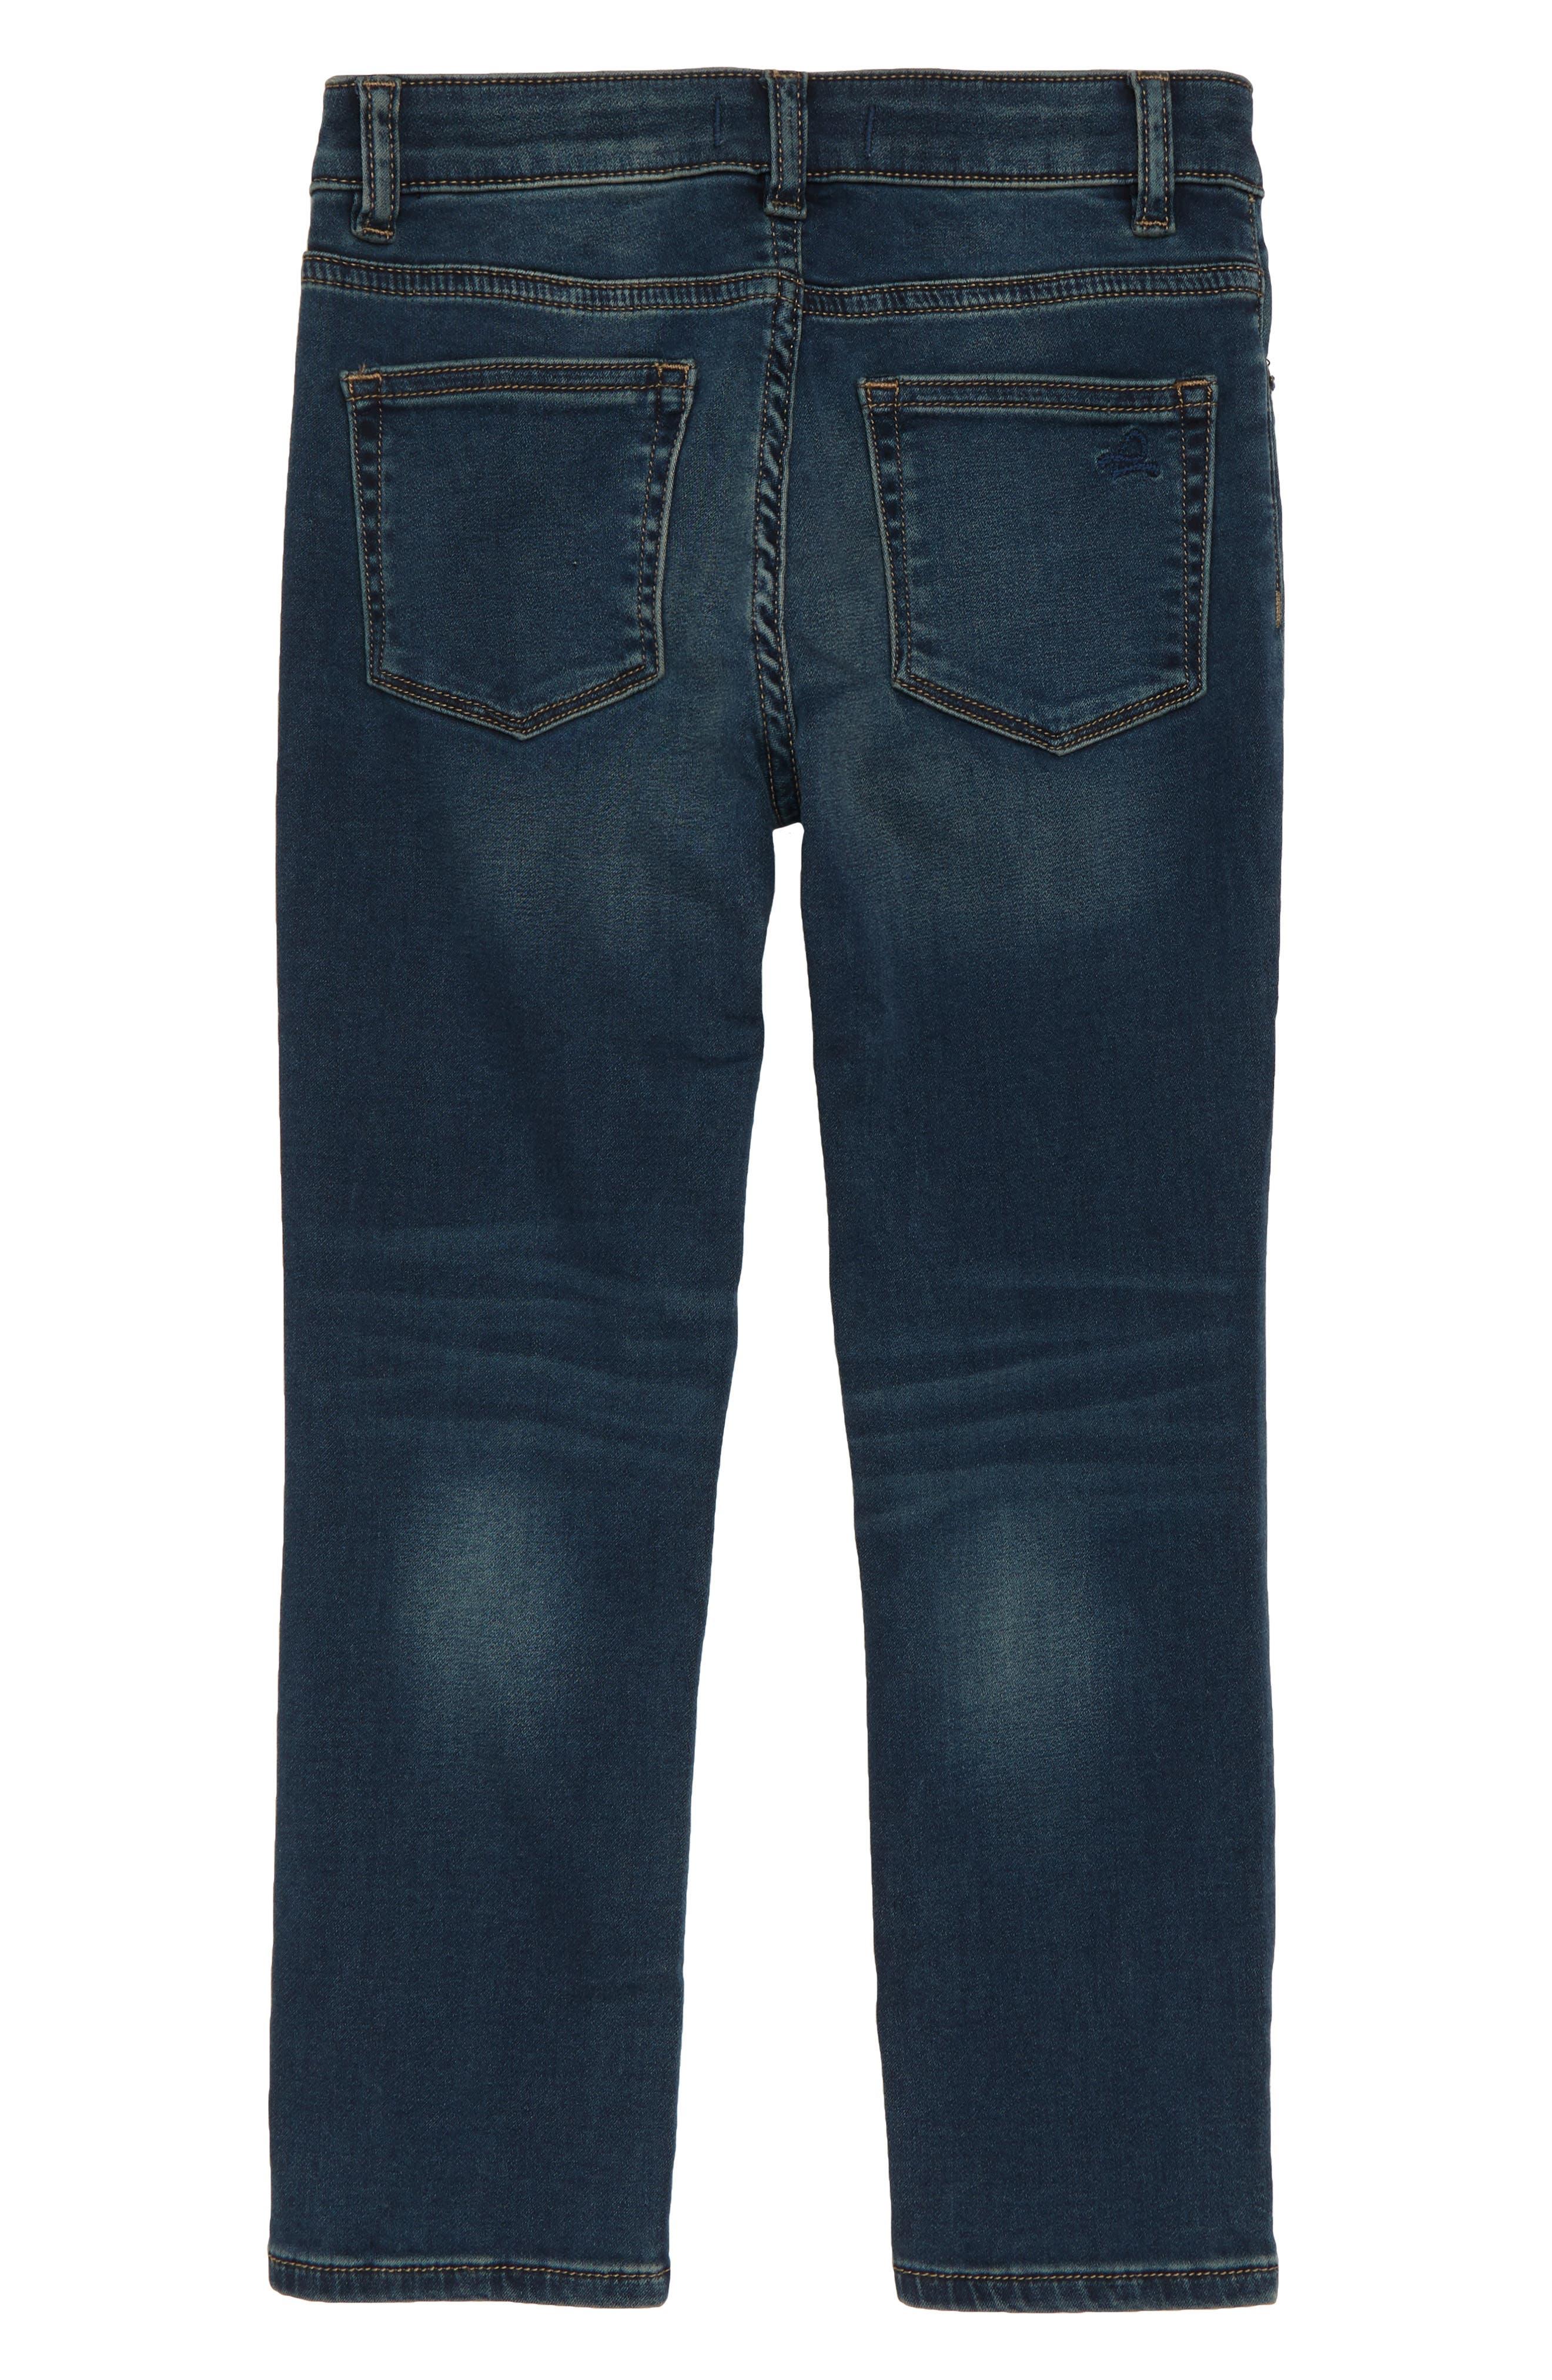 Brady Slim Fit Jeans,                             Alternate thumbnail 2, color,                             405